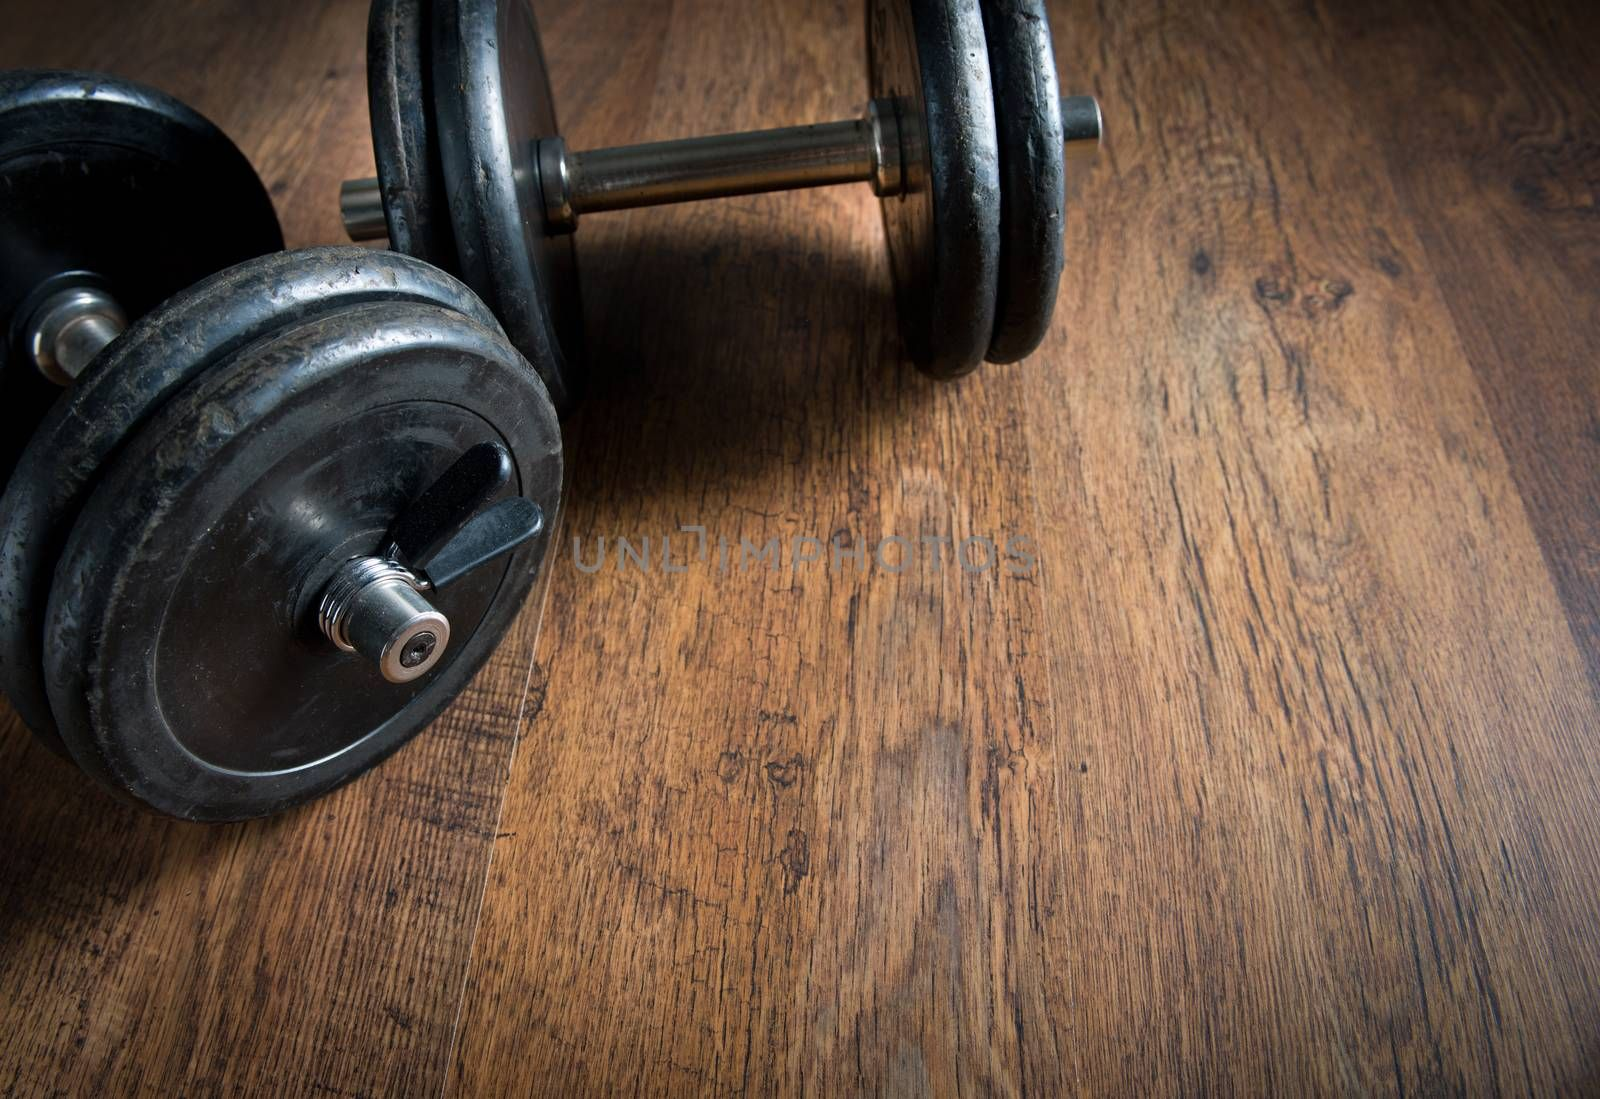 Black barbell weights on dark hardwood floor, weightlifting training concept.